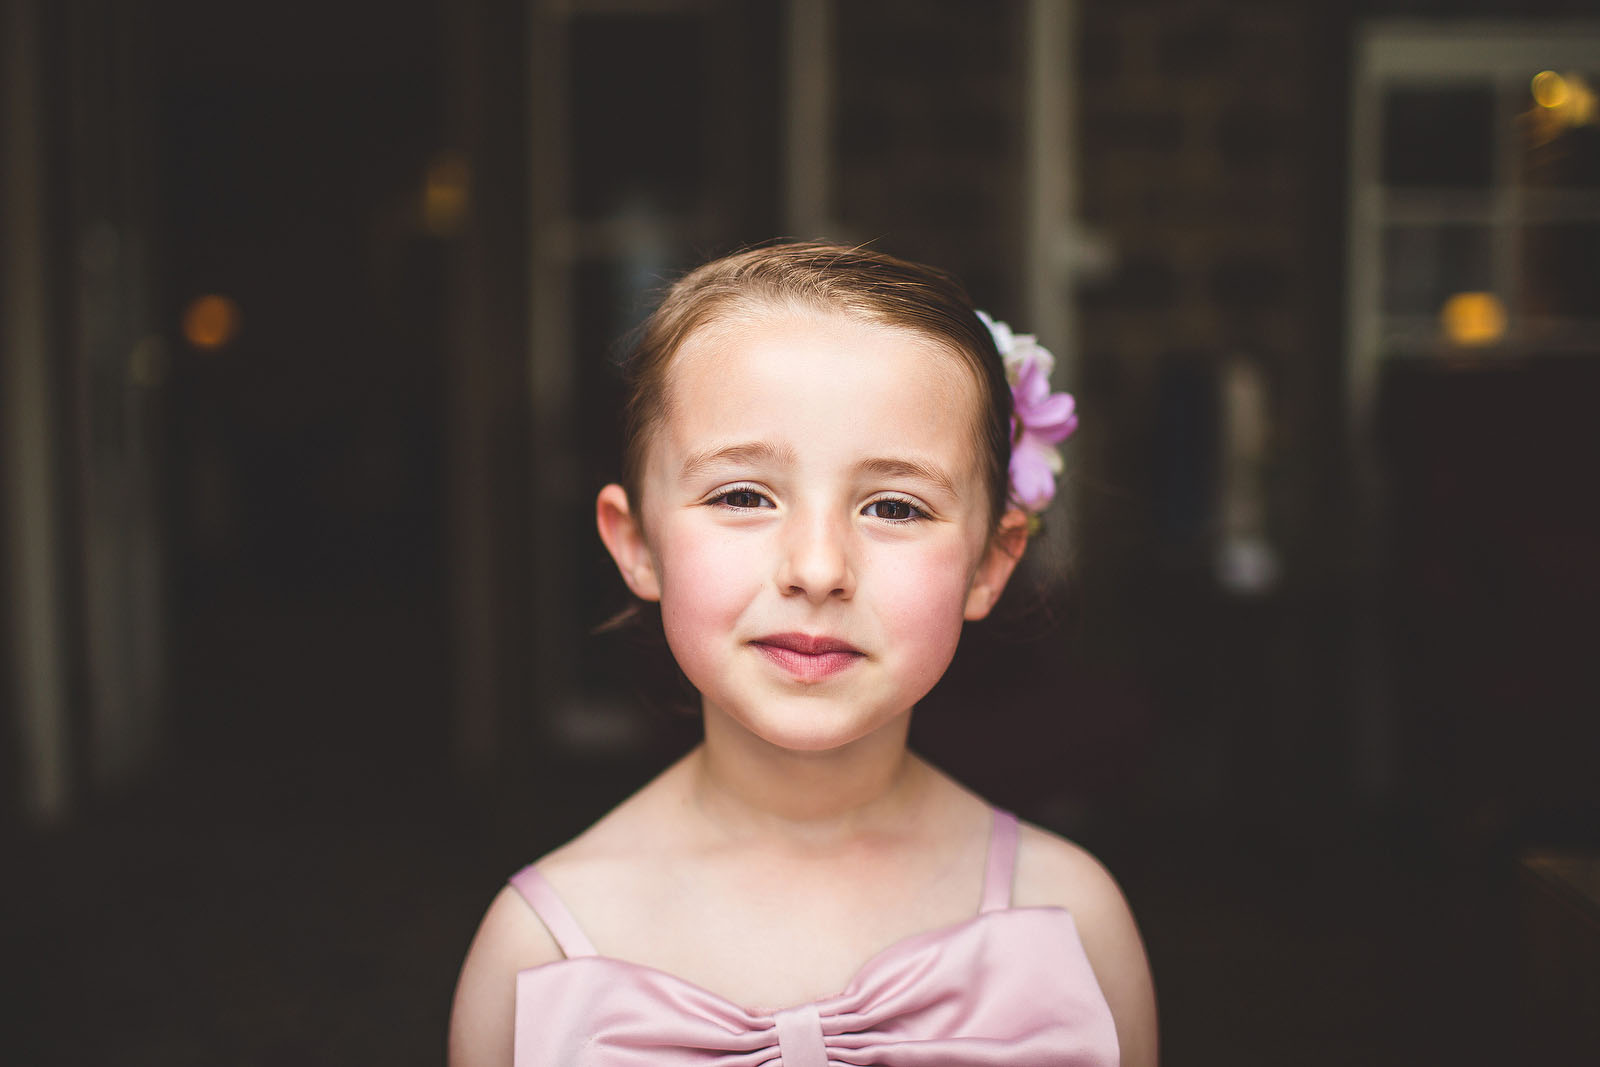 Chloe Dwayne